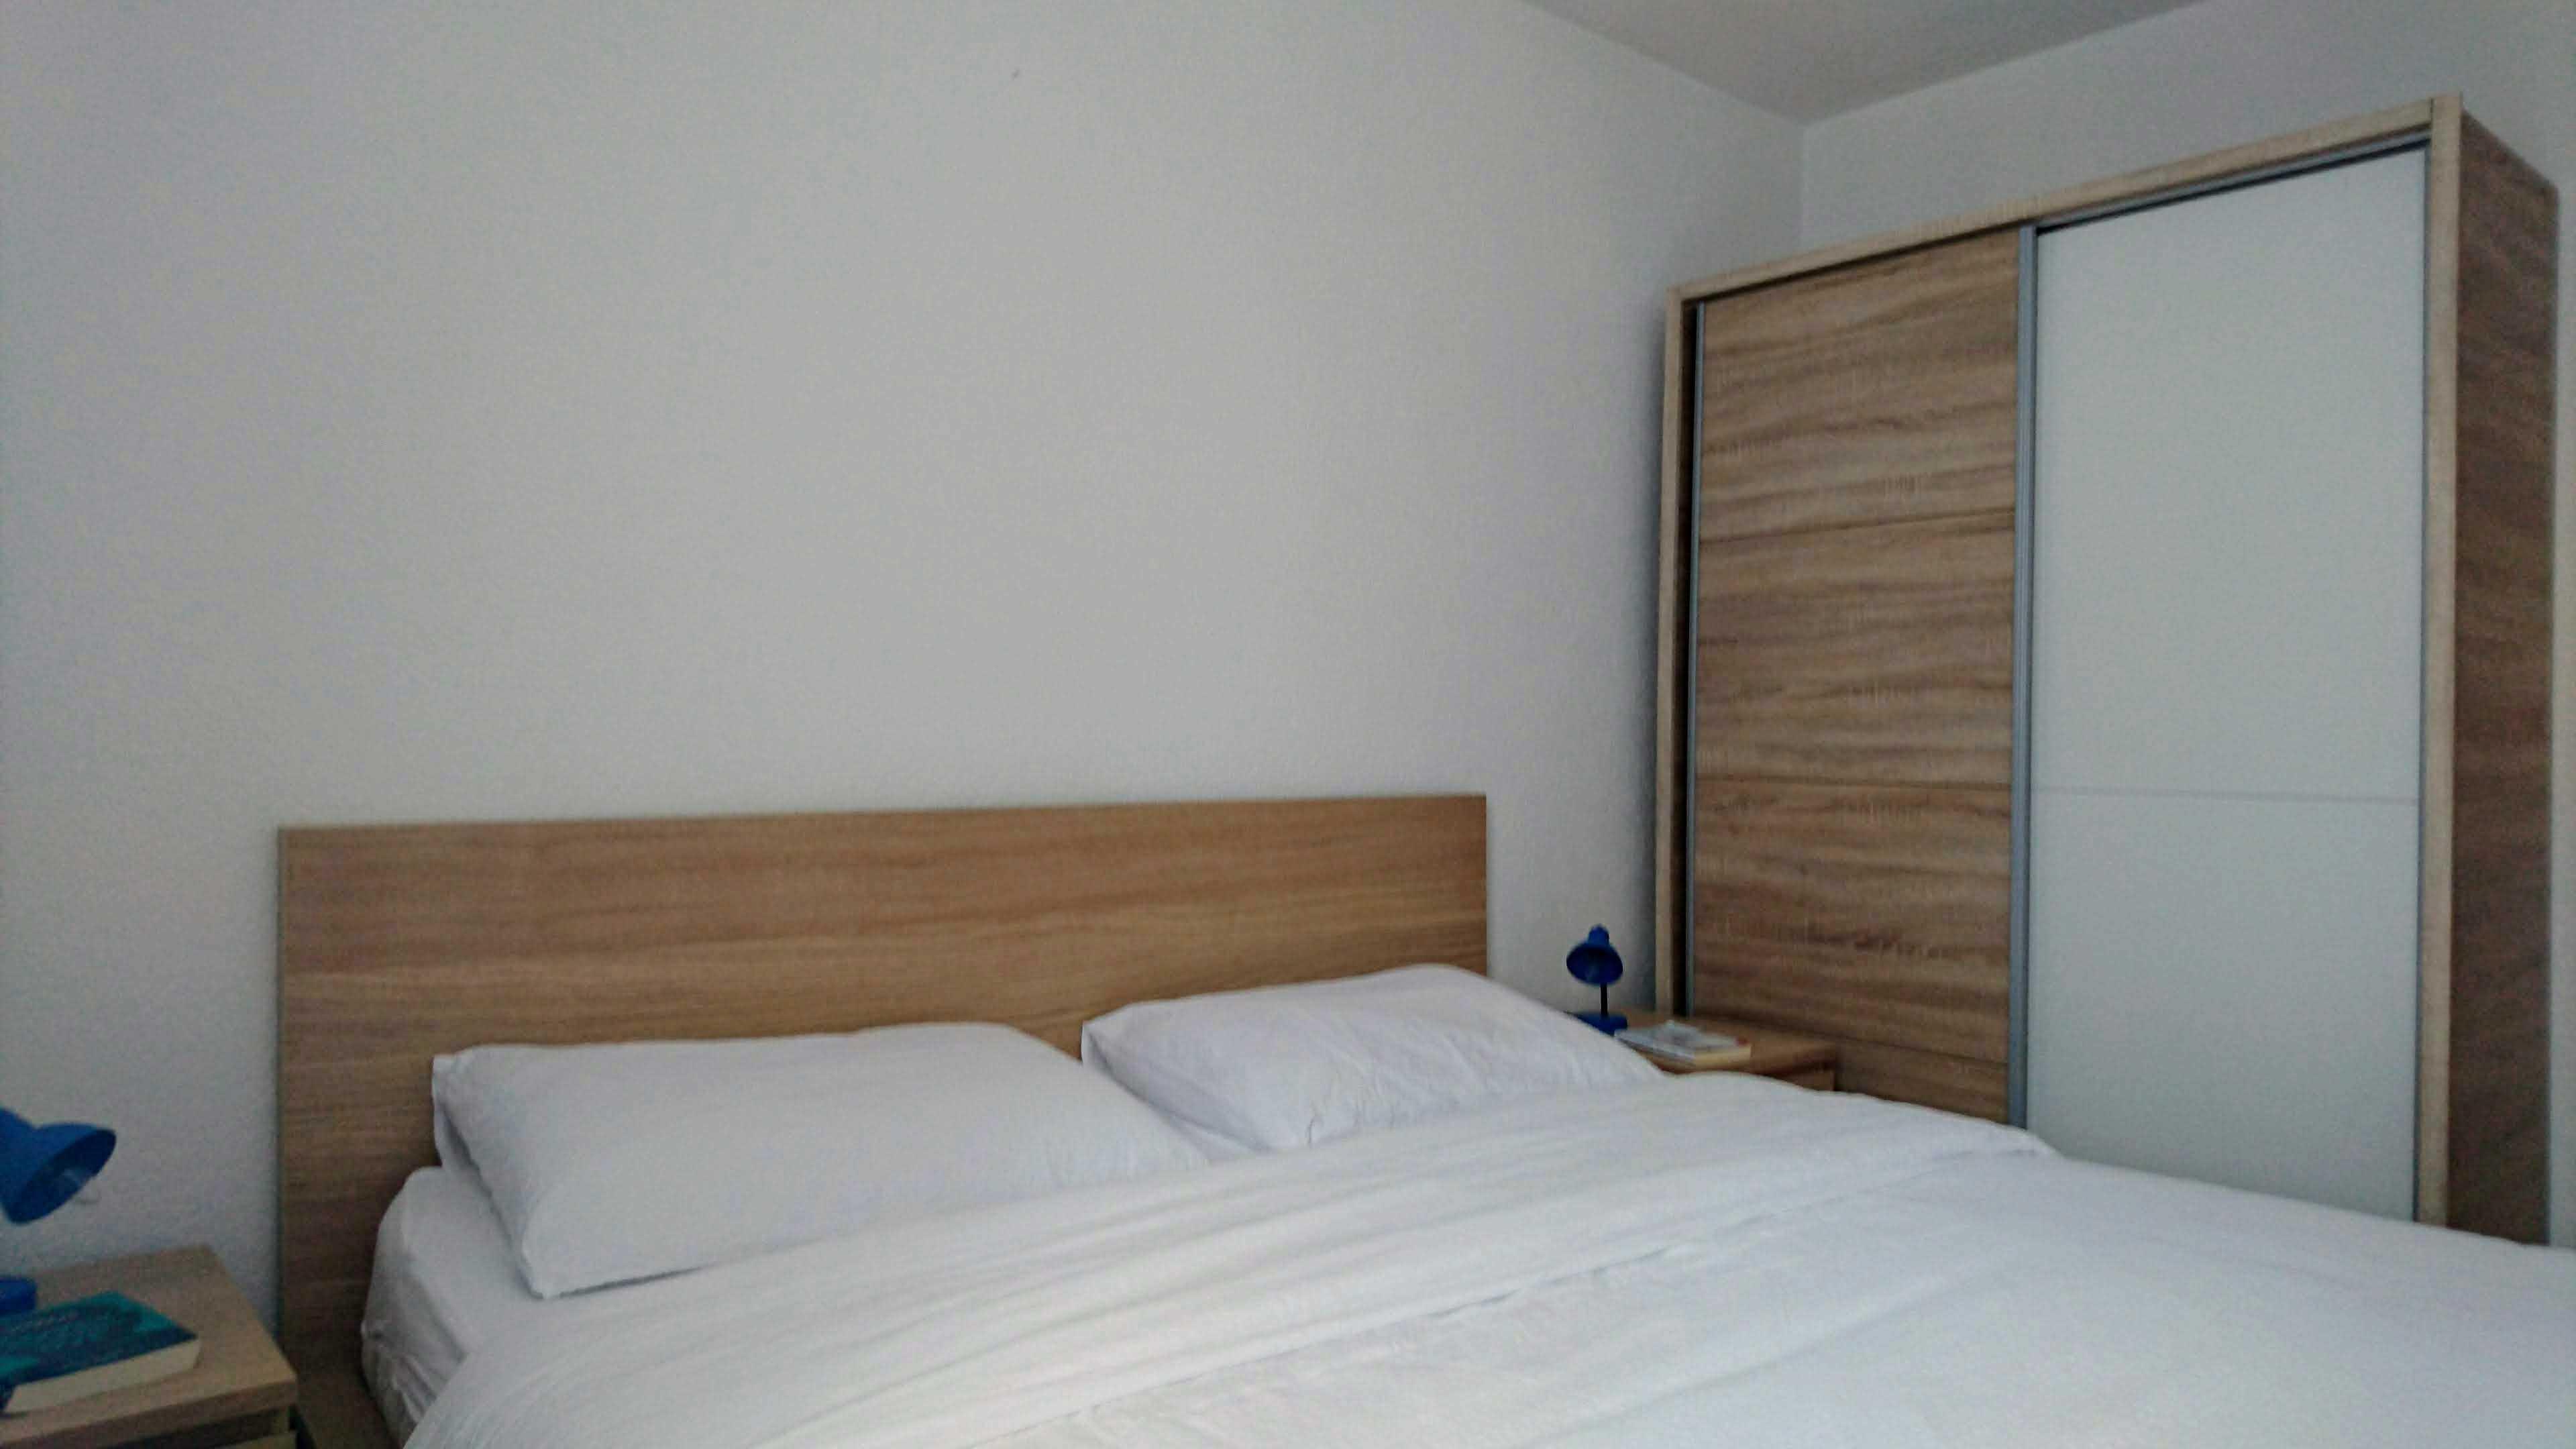 Apartamentos PRVA MASLINA - apartment BRAČ 26277, Baška Voda, , Região de Split-Dalmatia